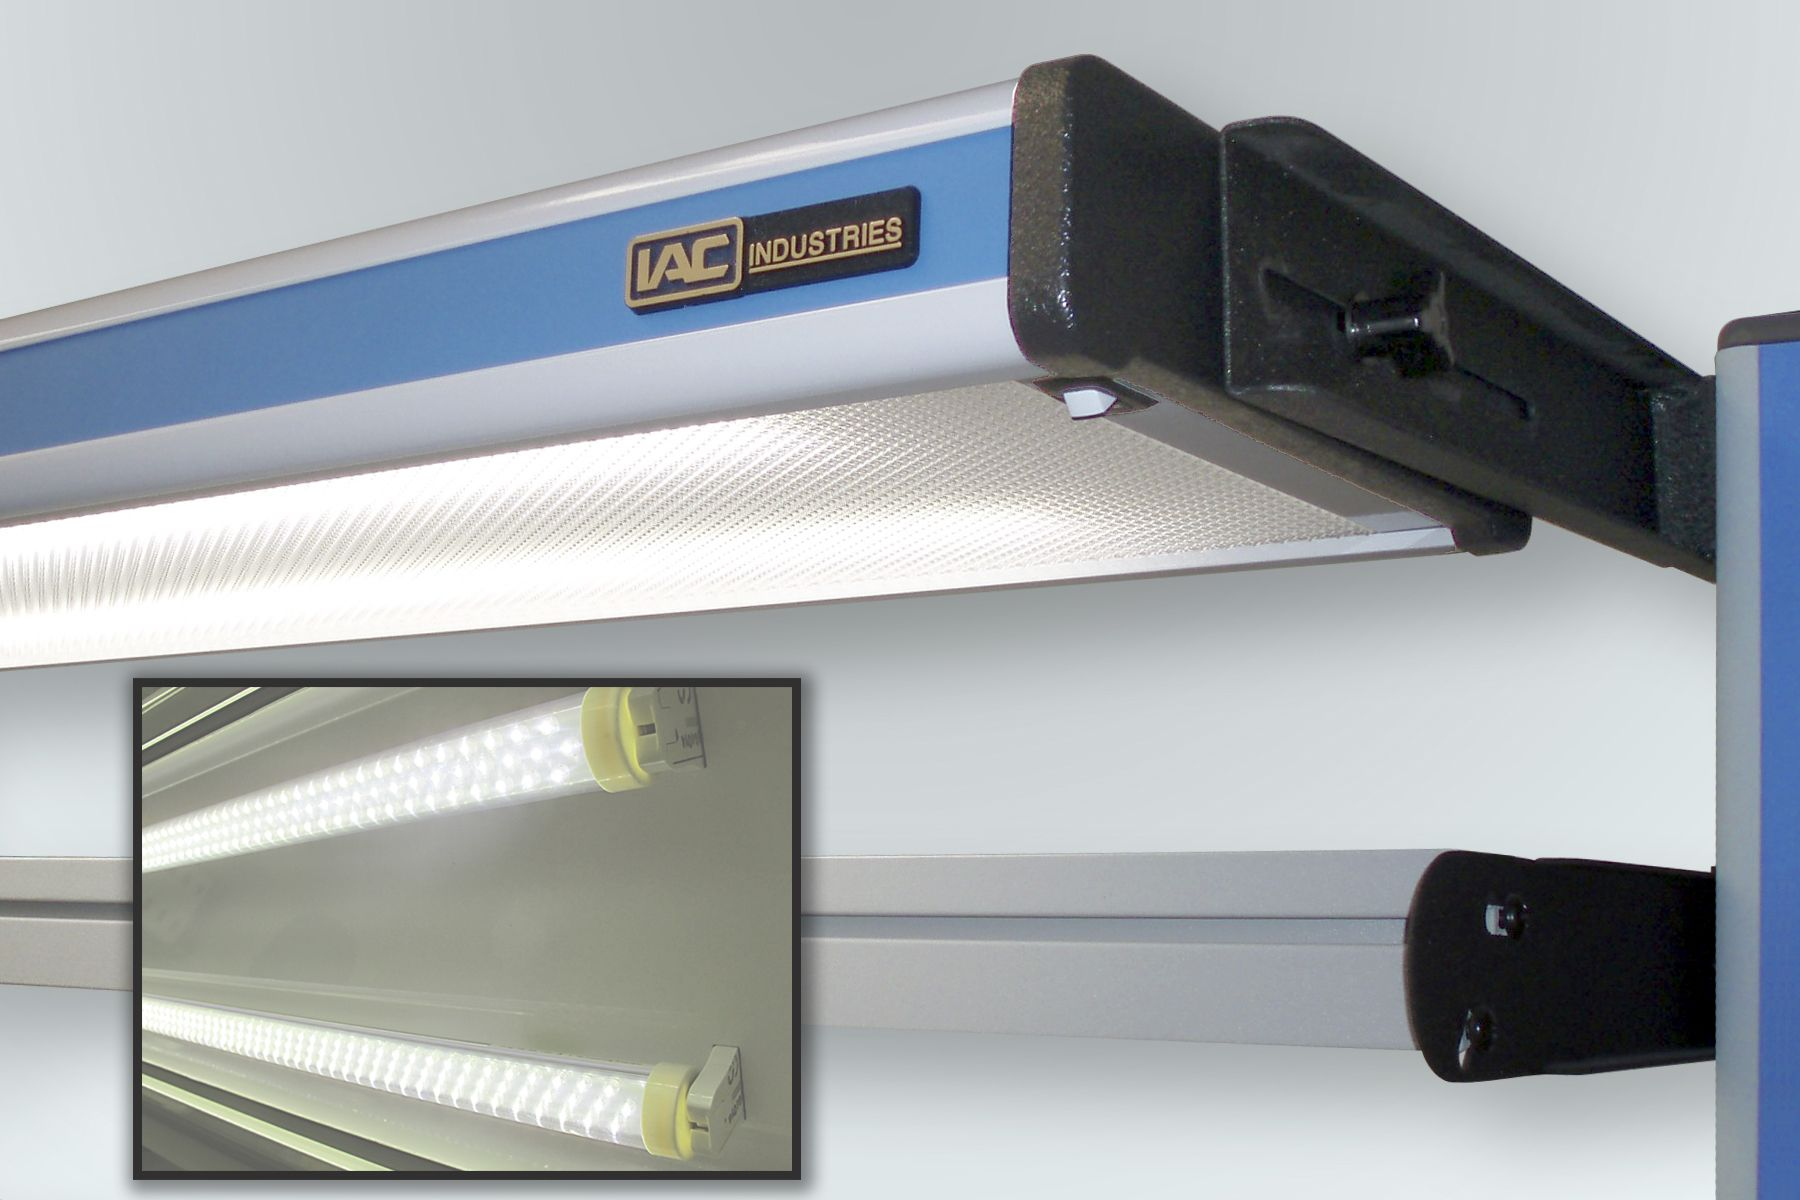 Pin By Scott Brown On Garage Workbench Light Led